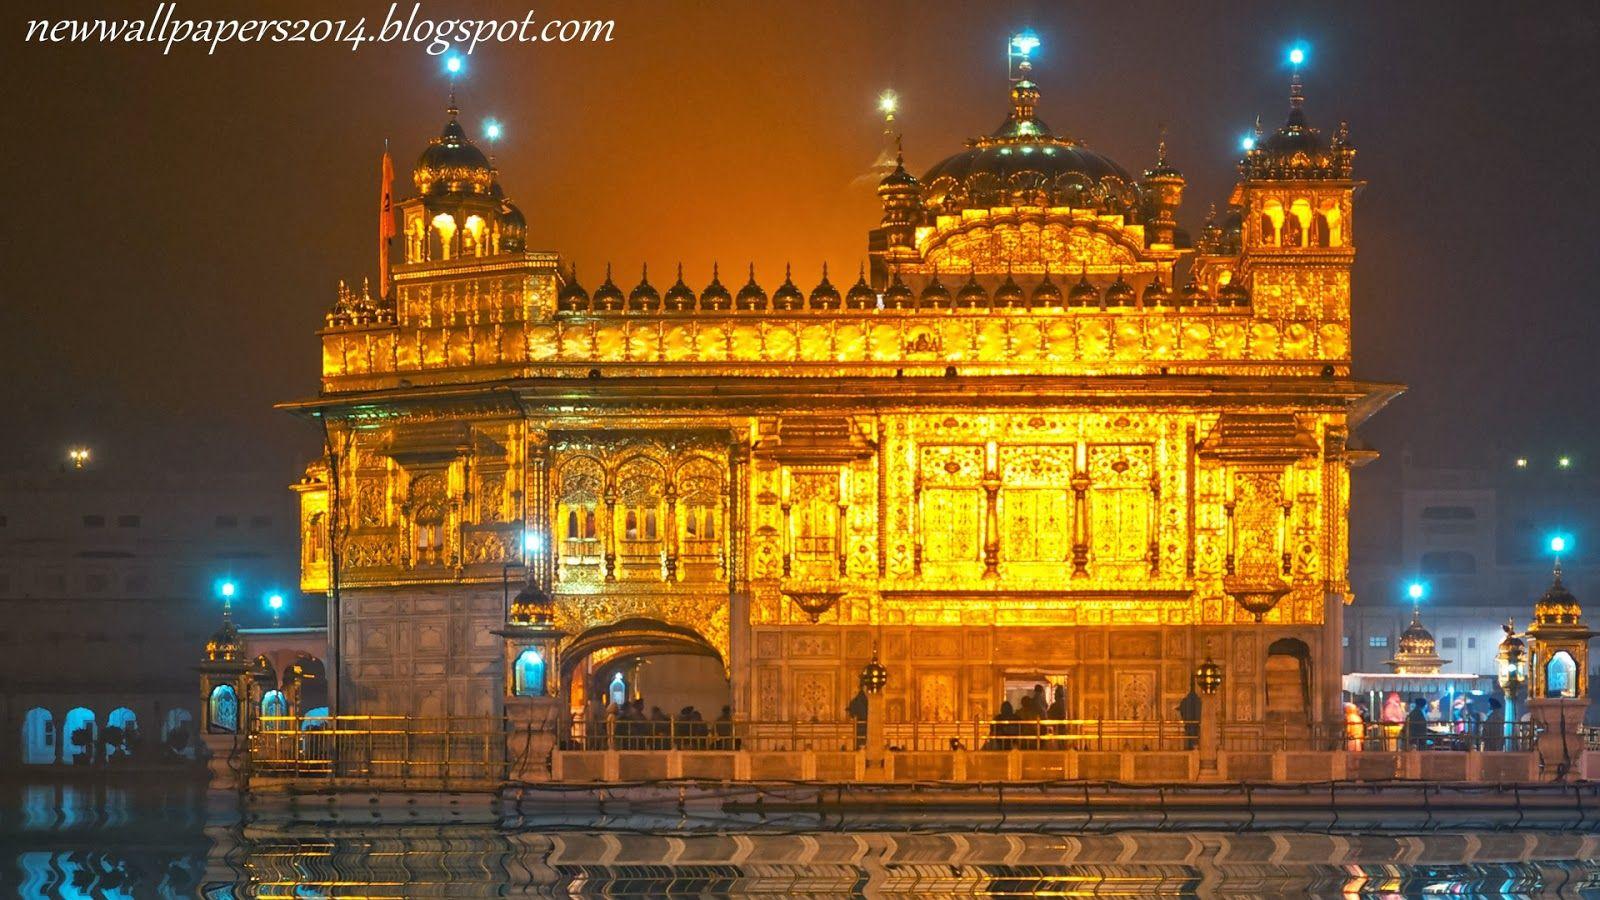 Golden Temple Hd Wallpaper Wallpapersafari Golden Temple Amritsar Golden Temple Amritsar Hd Wallpaper Golden Temple